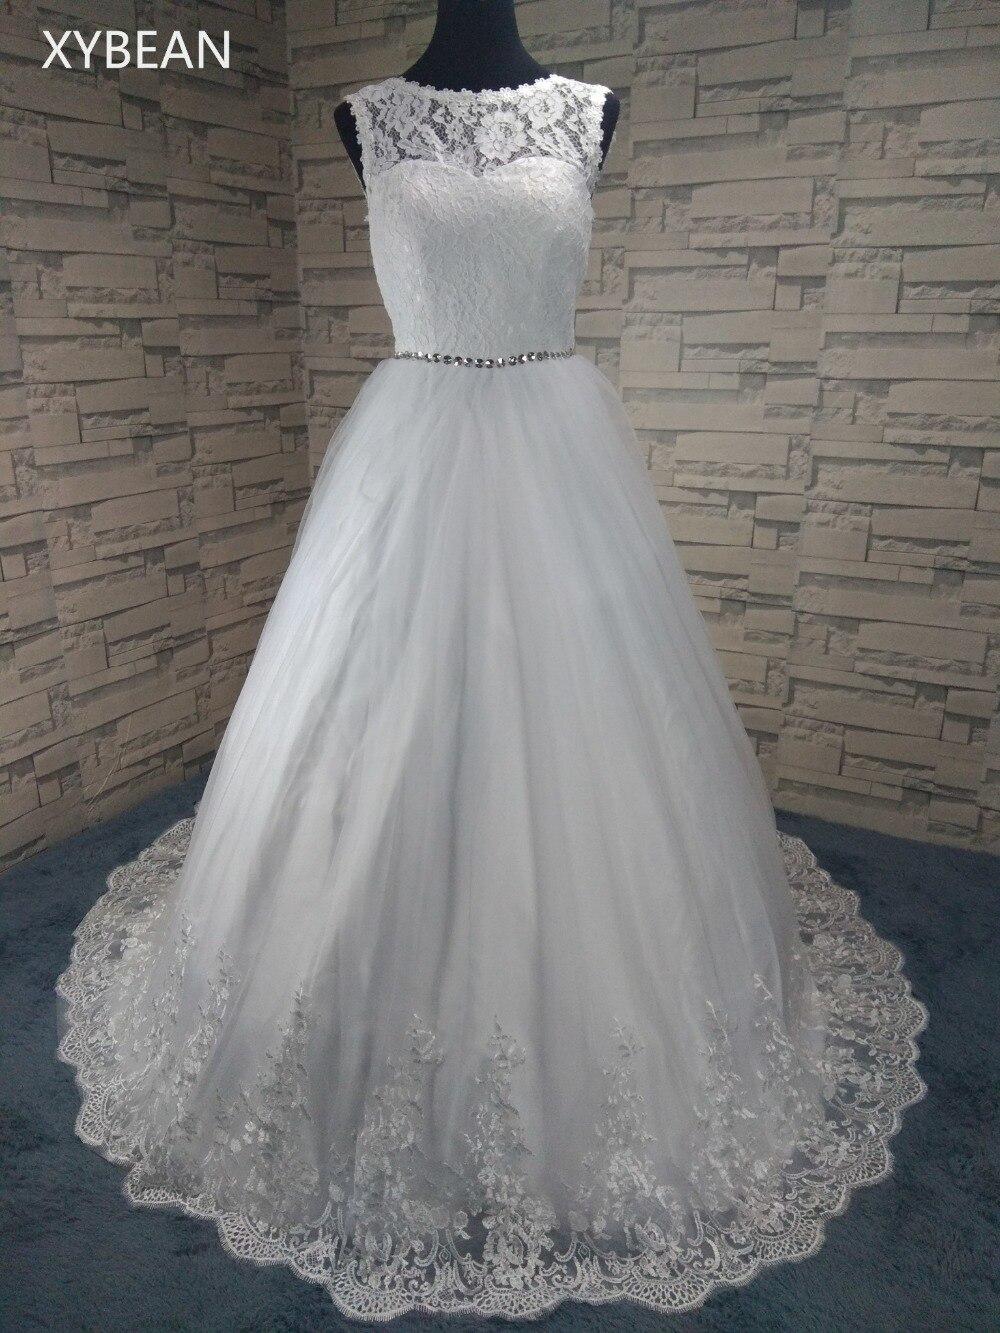 Popular victorian wedding dresses buy cheap victorian wedding - Victorian Lace Wedding Dresses